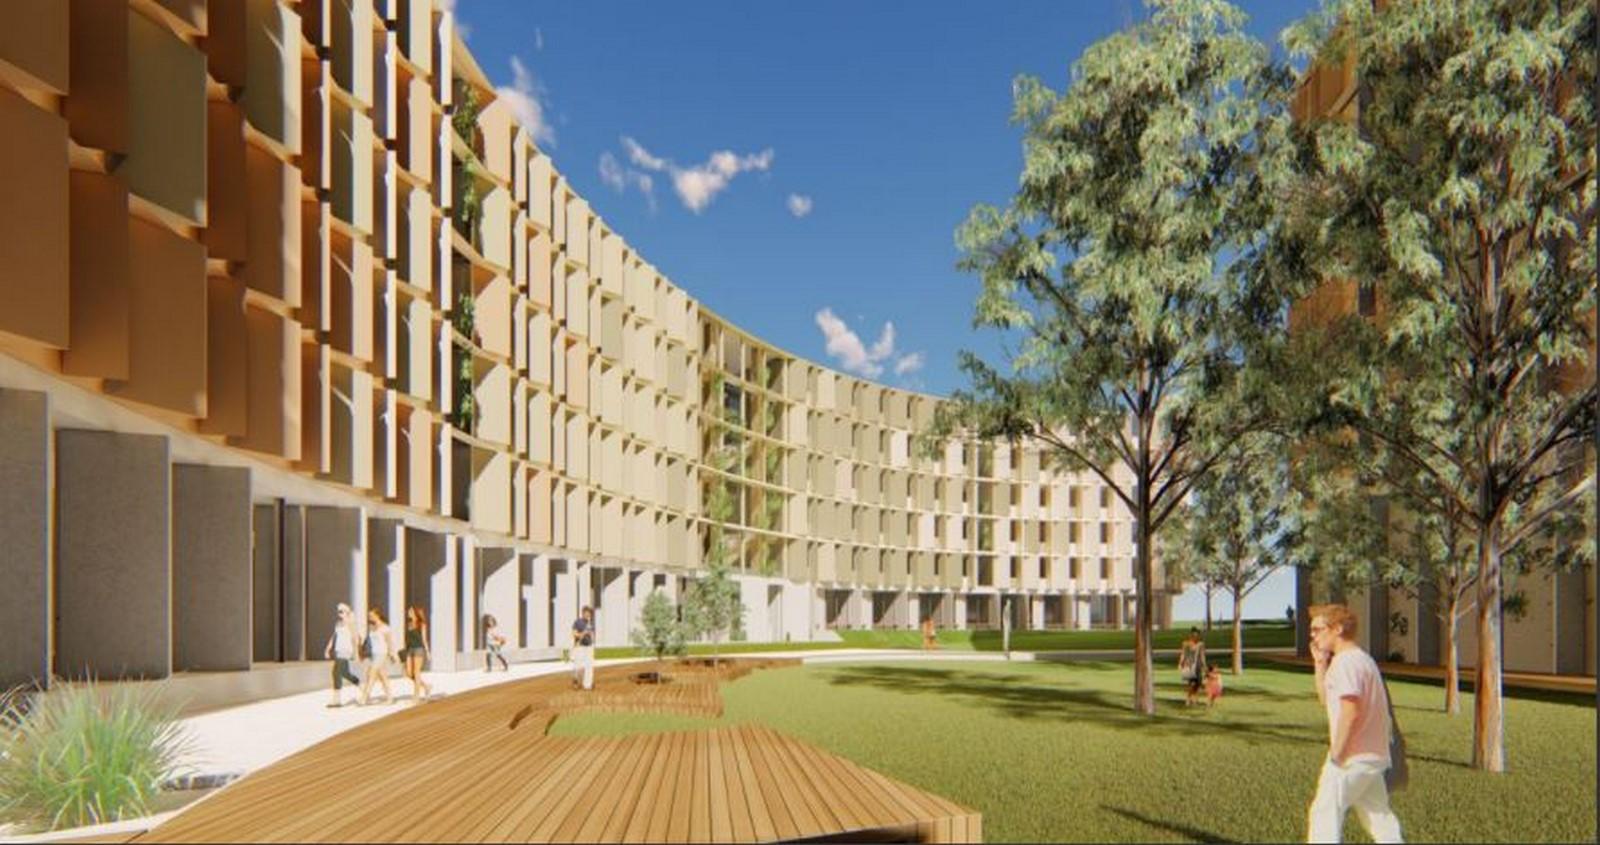 Student Accommodation by JCB Architects- Sheet2